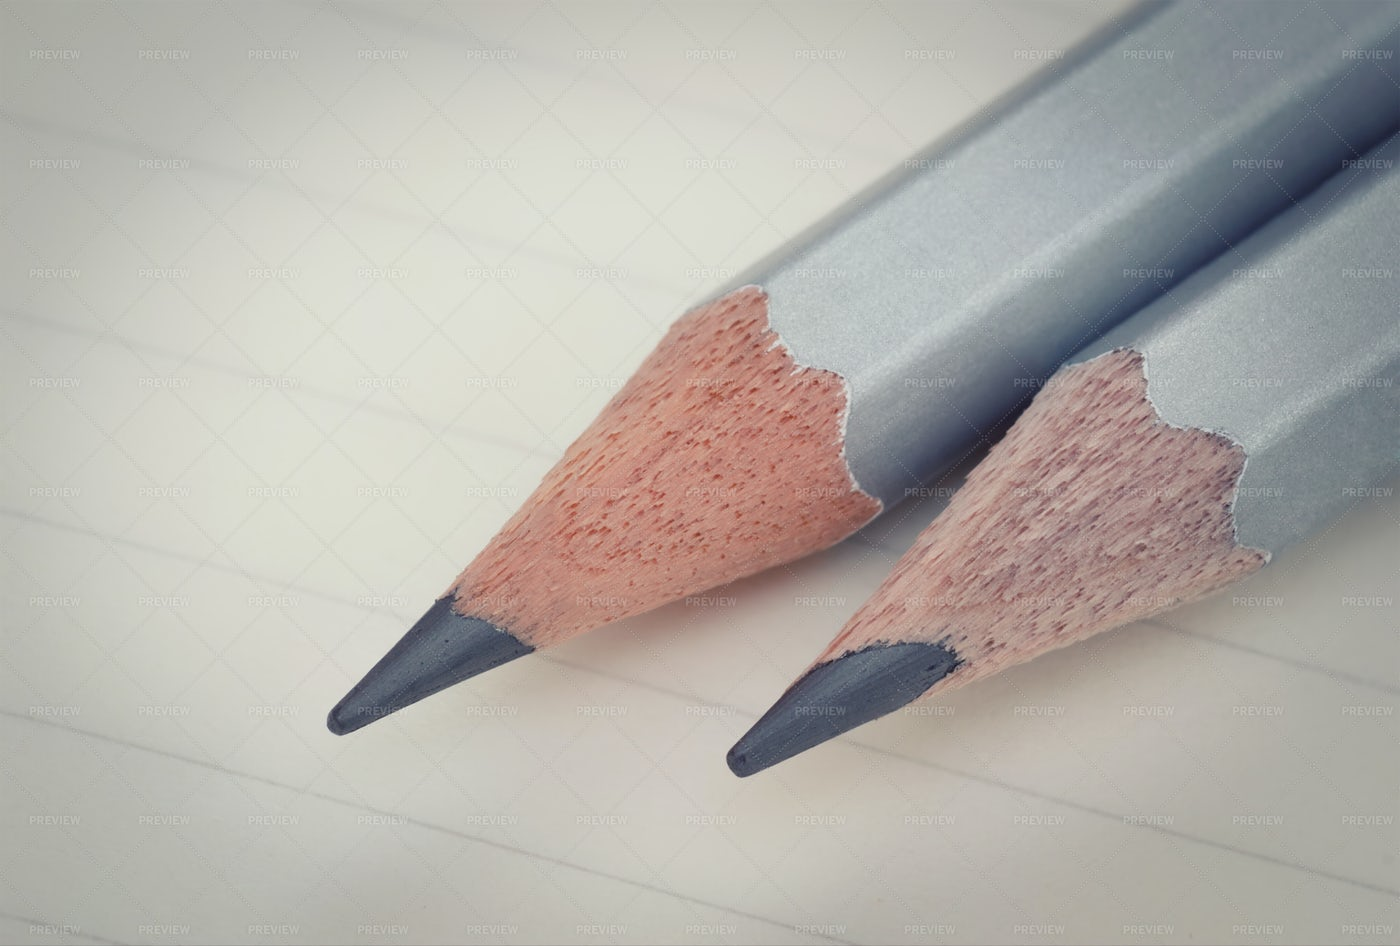 Two Graphite Pencils: Stock Photos